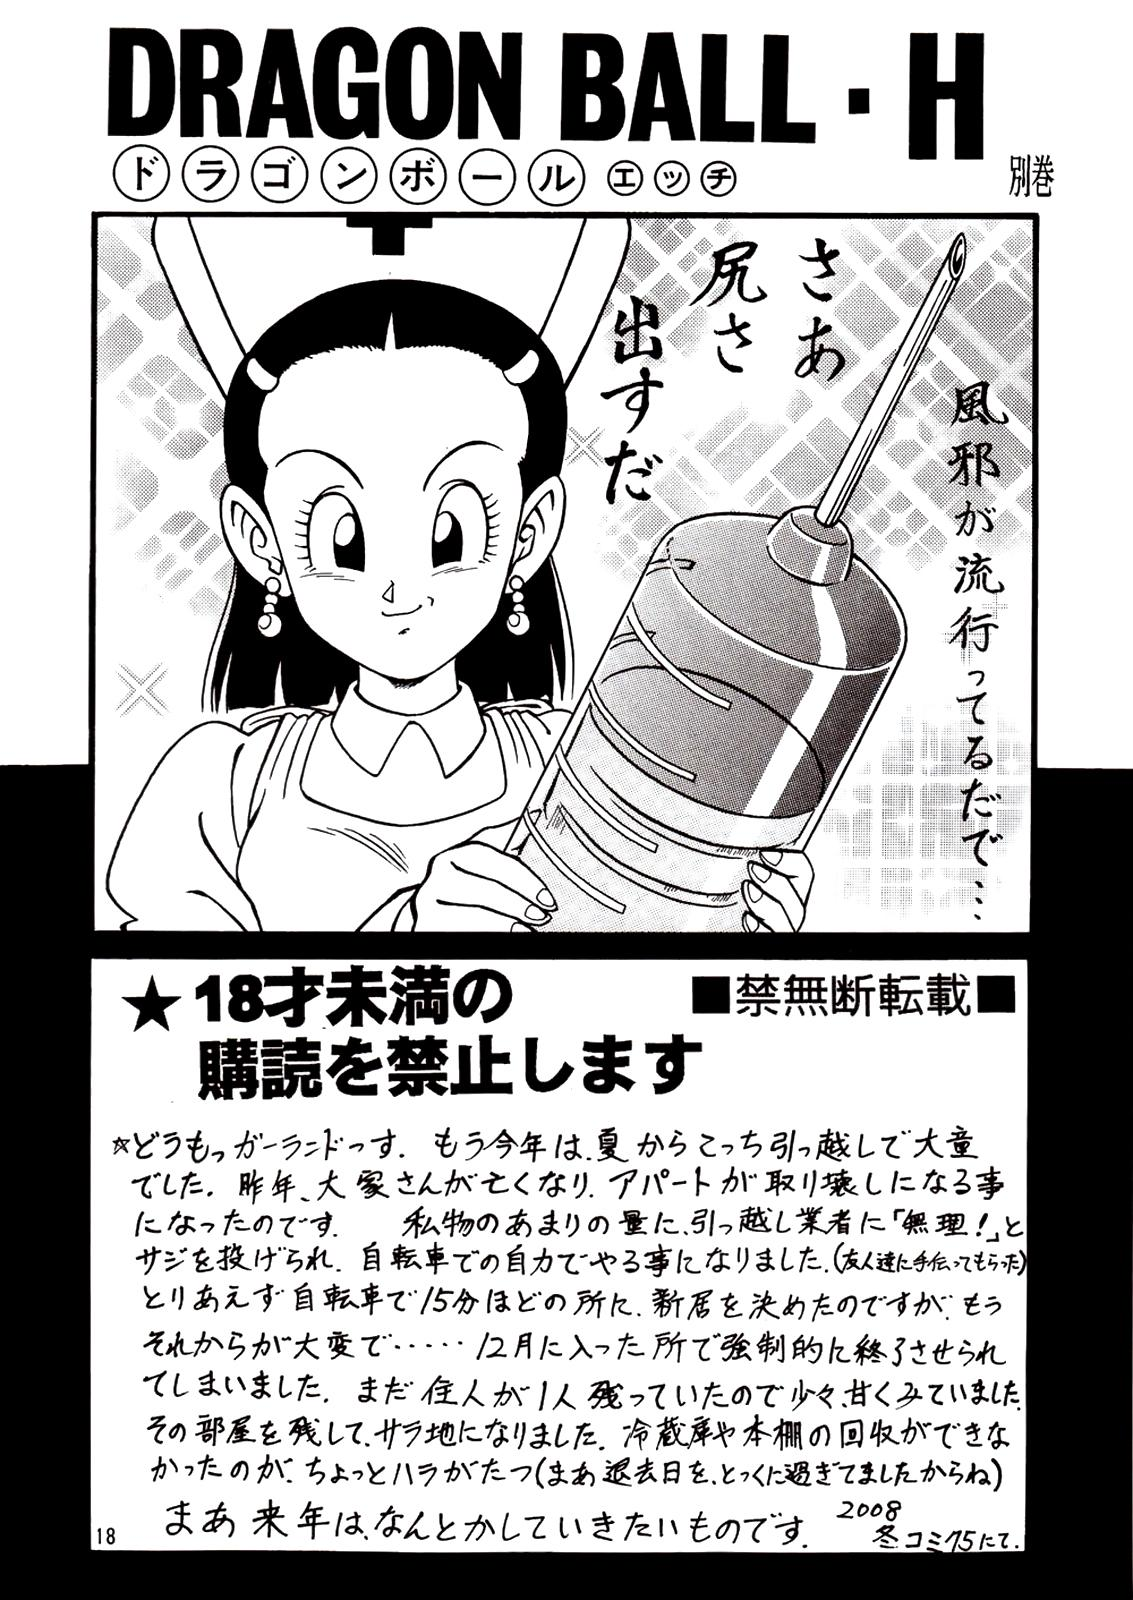 DRAGONBALL H Bekkan | Dragonball H Extra Issue 16